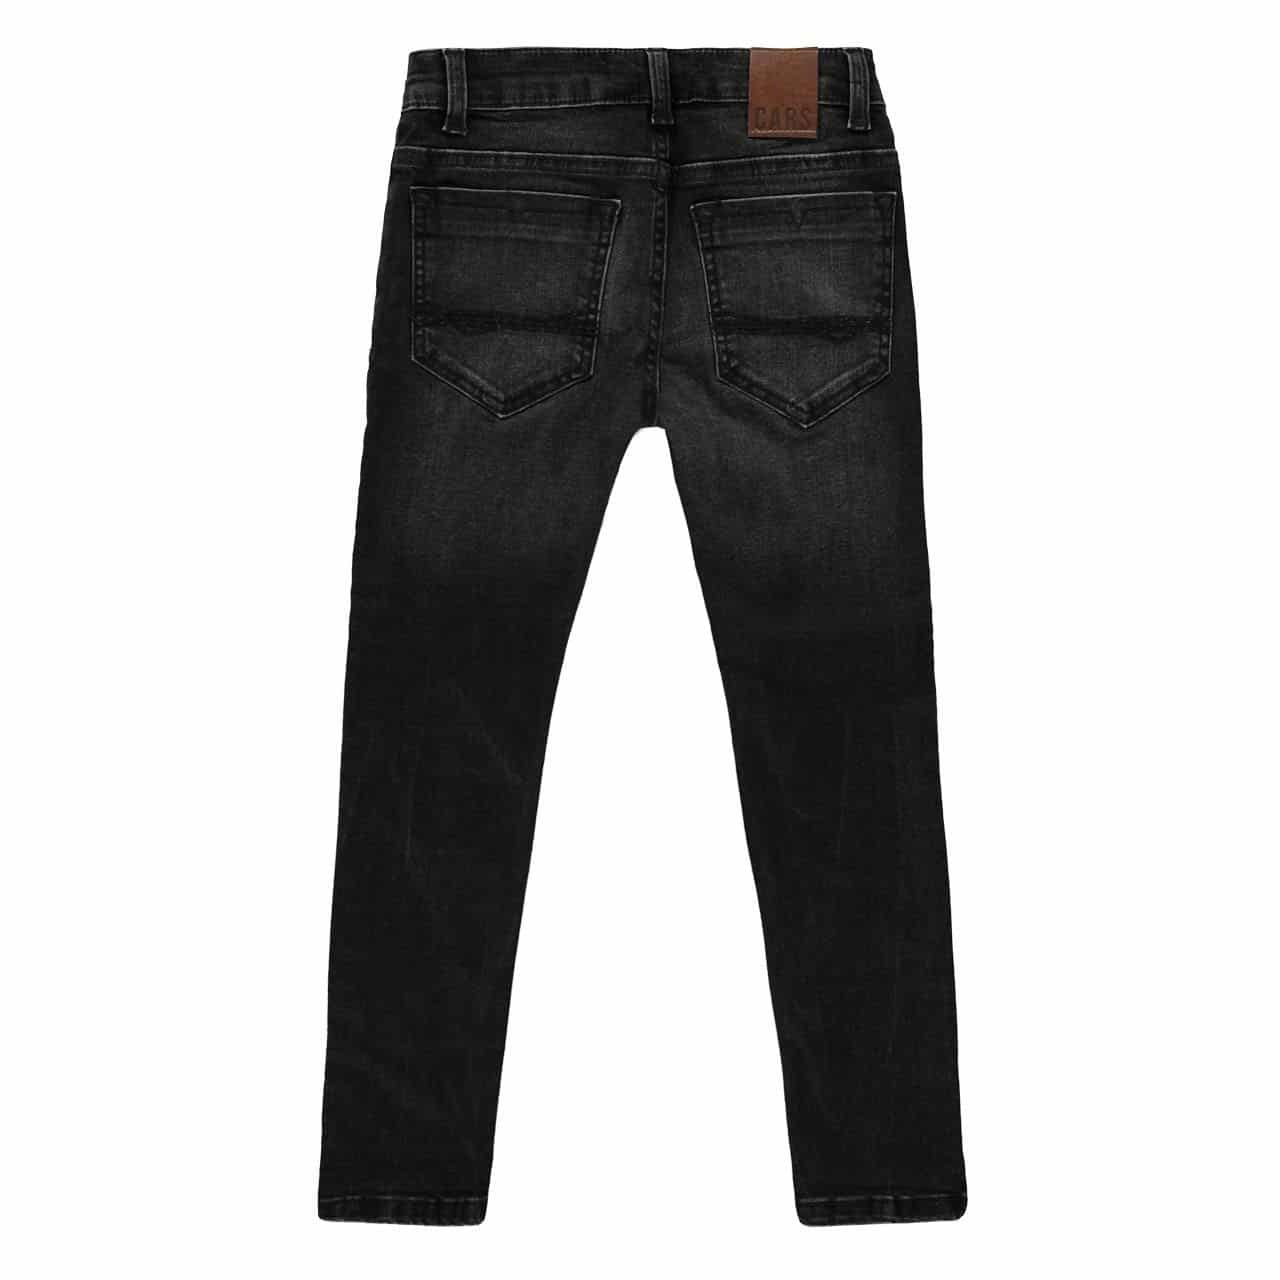 Cars Jeans  Trust Black